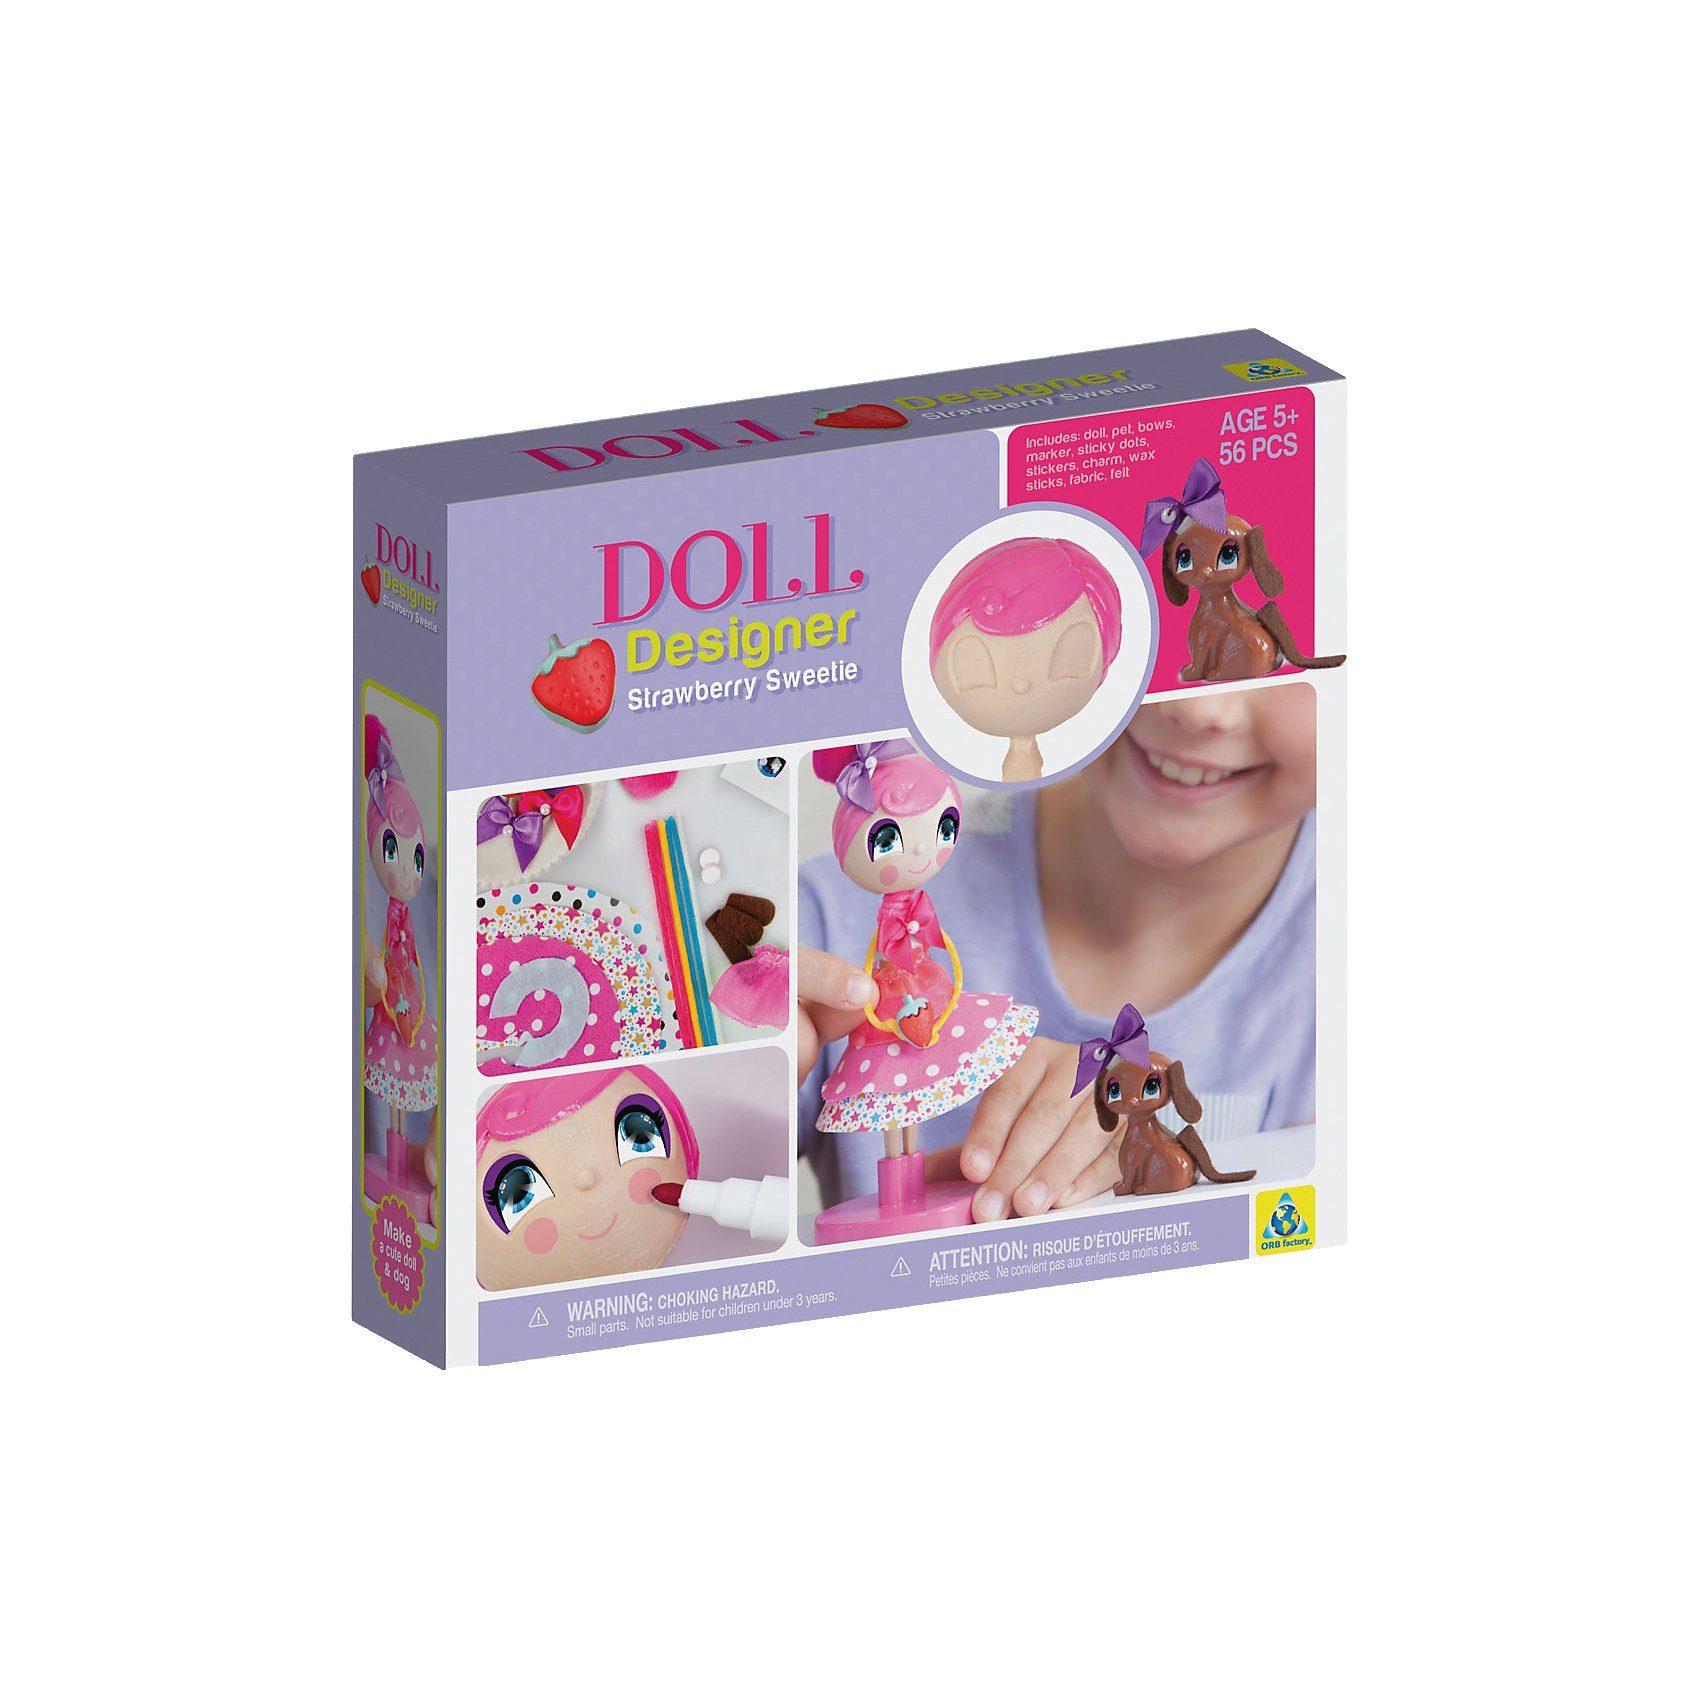 Doll Designer Strawberry Sweety